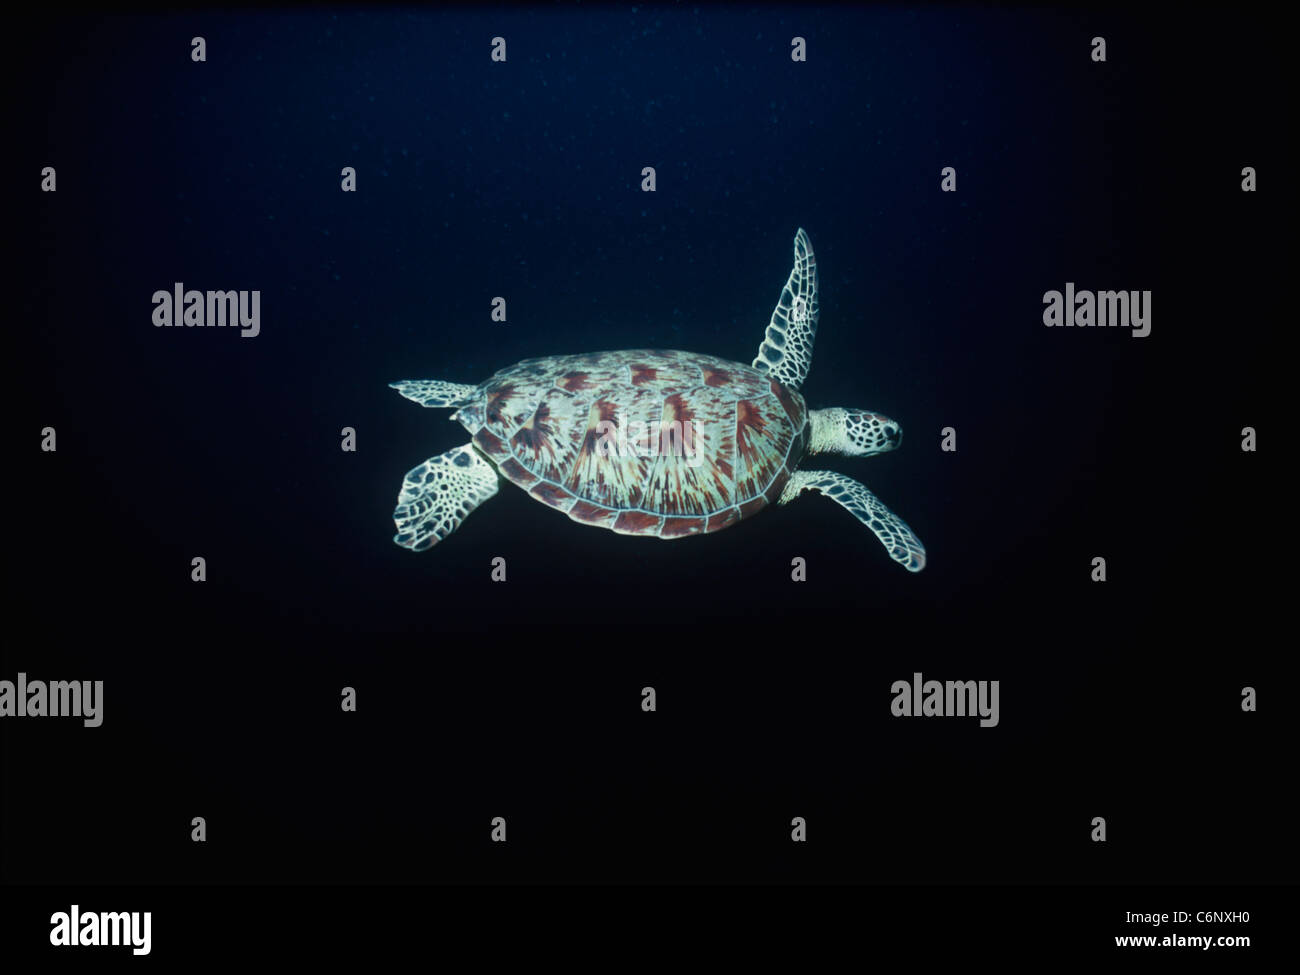 Green Turtle (Chelonia mydas) swimming in the open ocean at night. Sipadan Island, Borneo, South China Sea - Stock Image